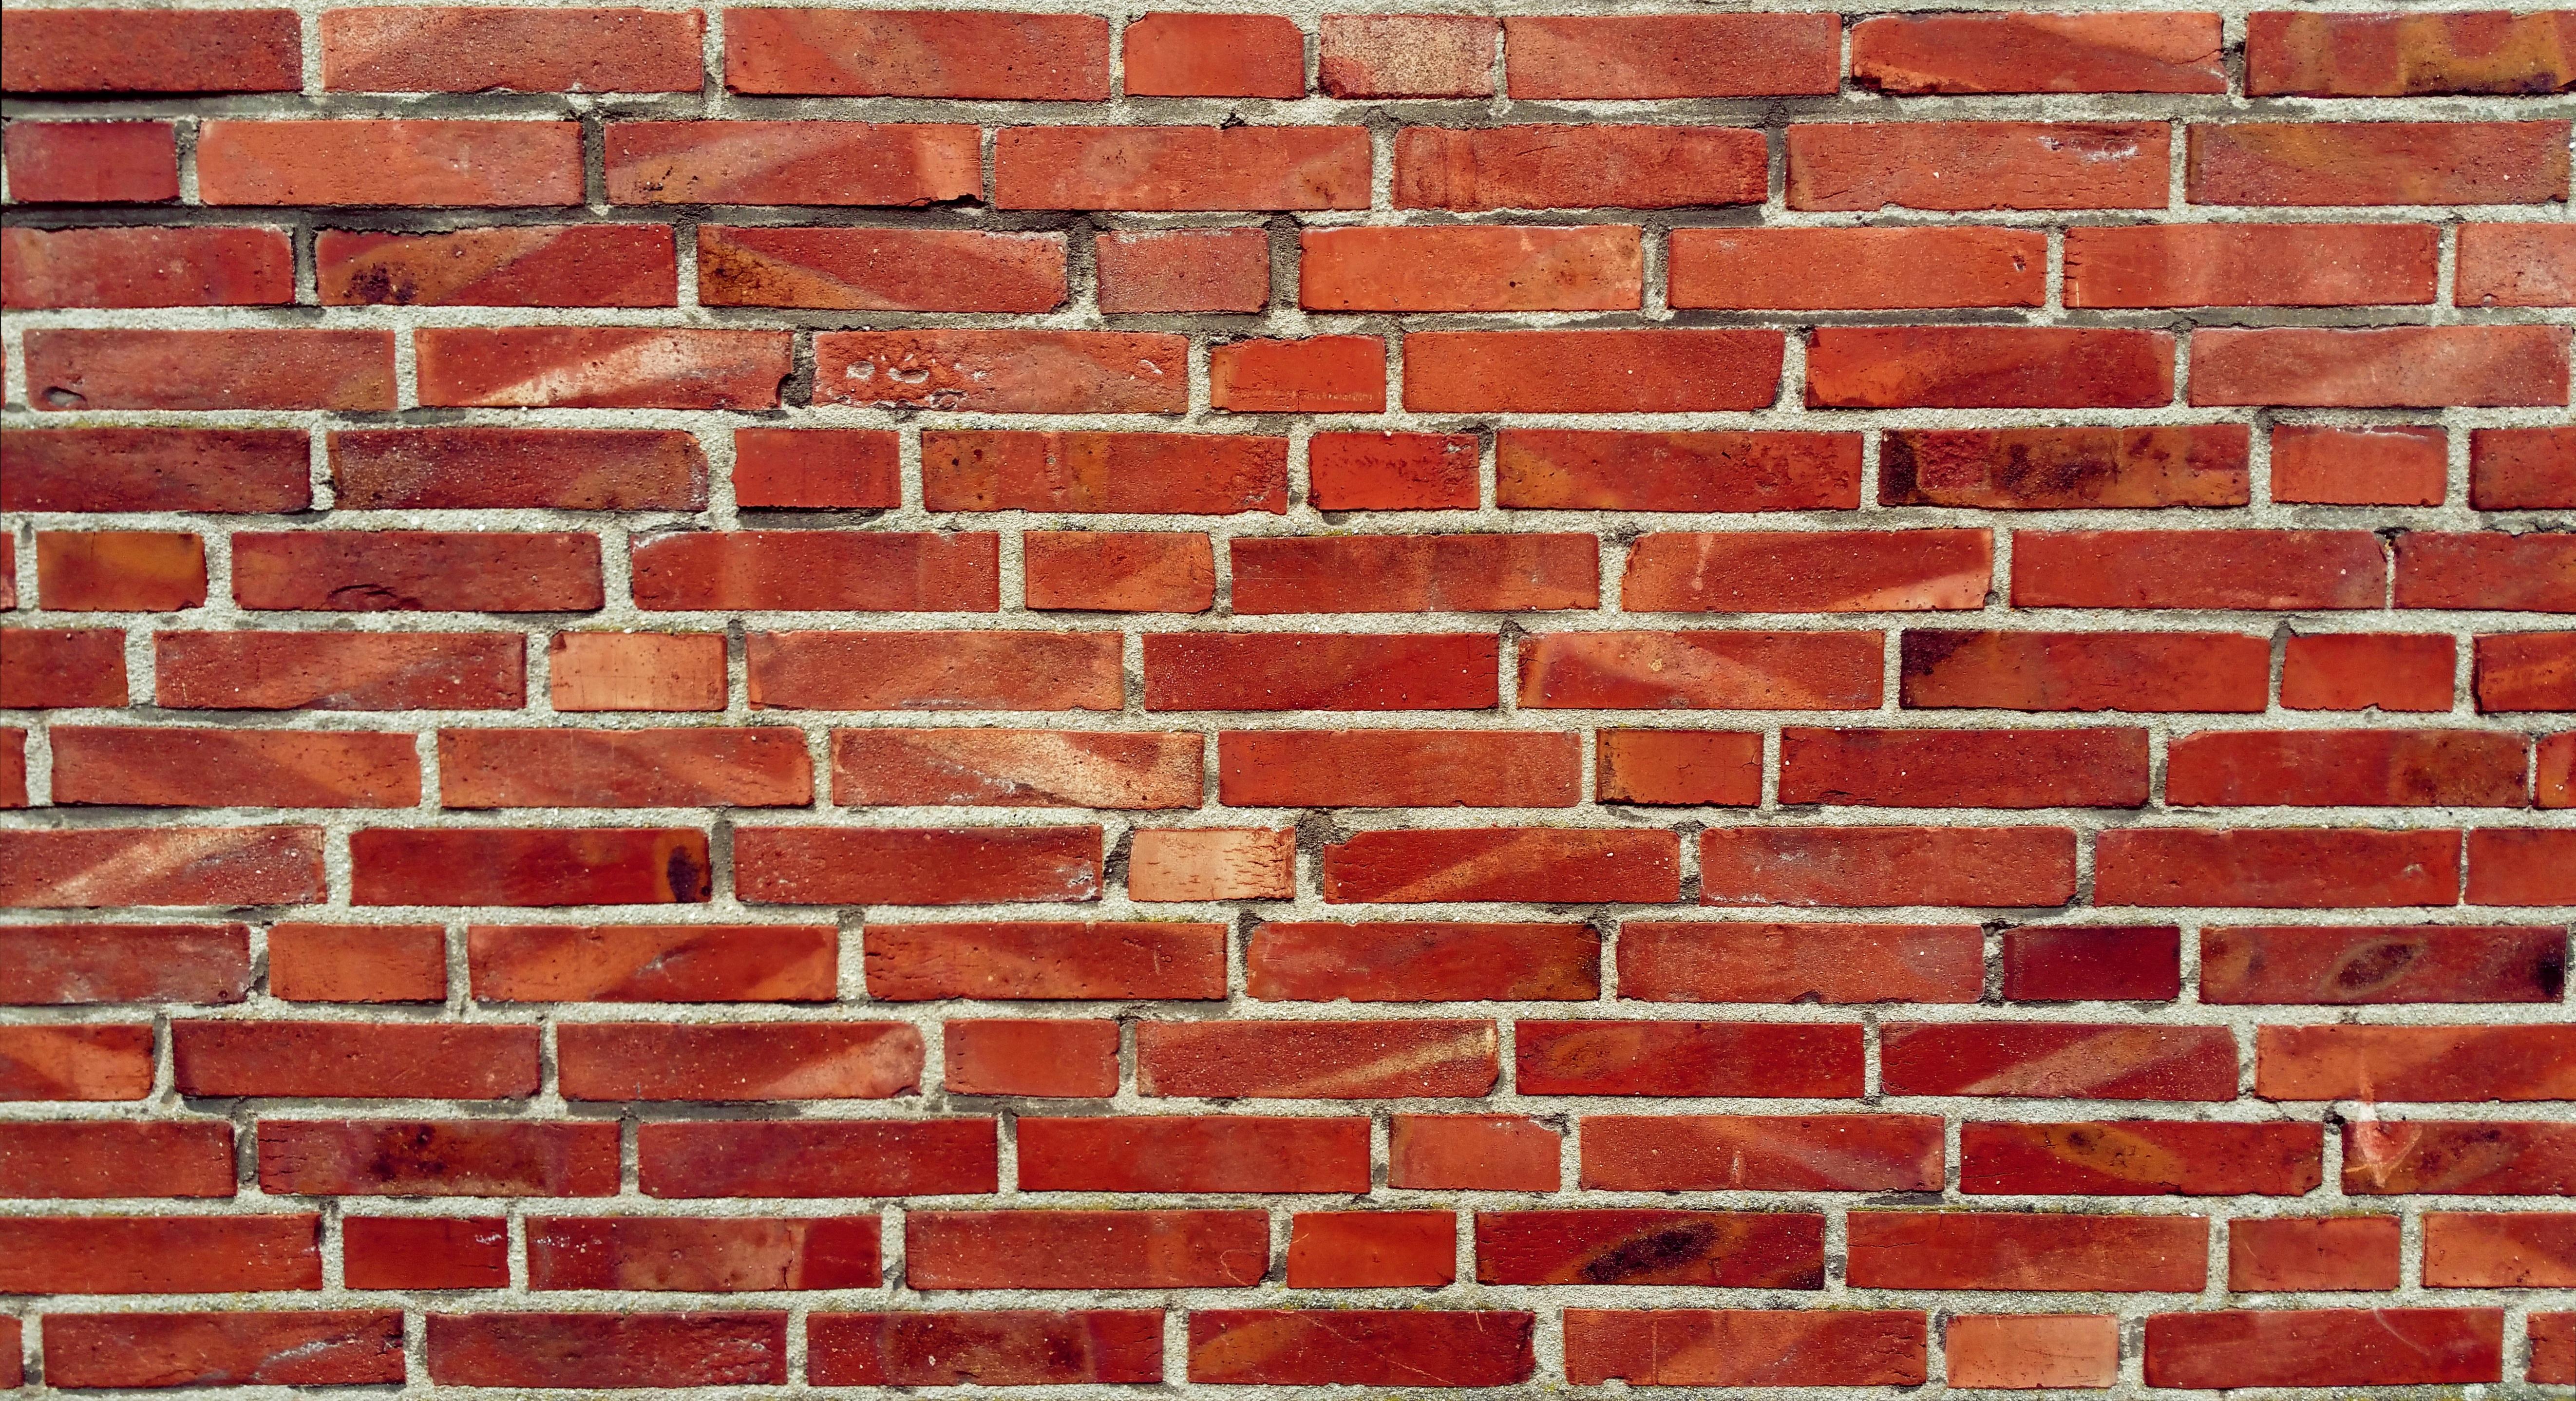 Fotos gratis estructura textura pared patr n - Ladrillos para pared ...